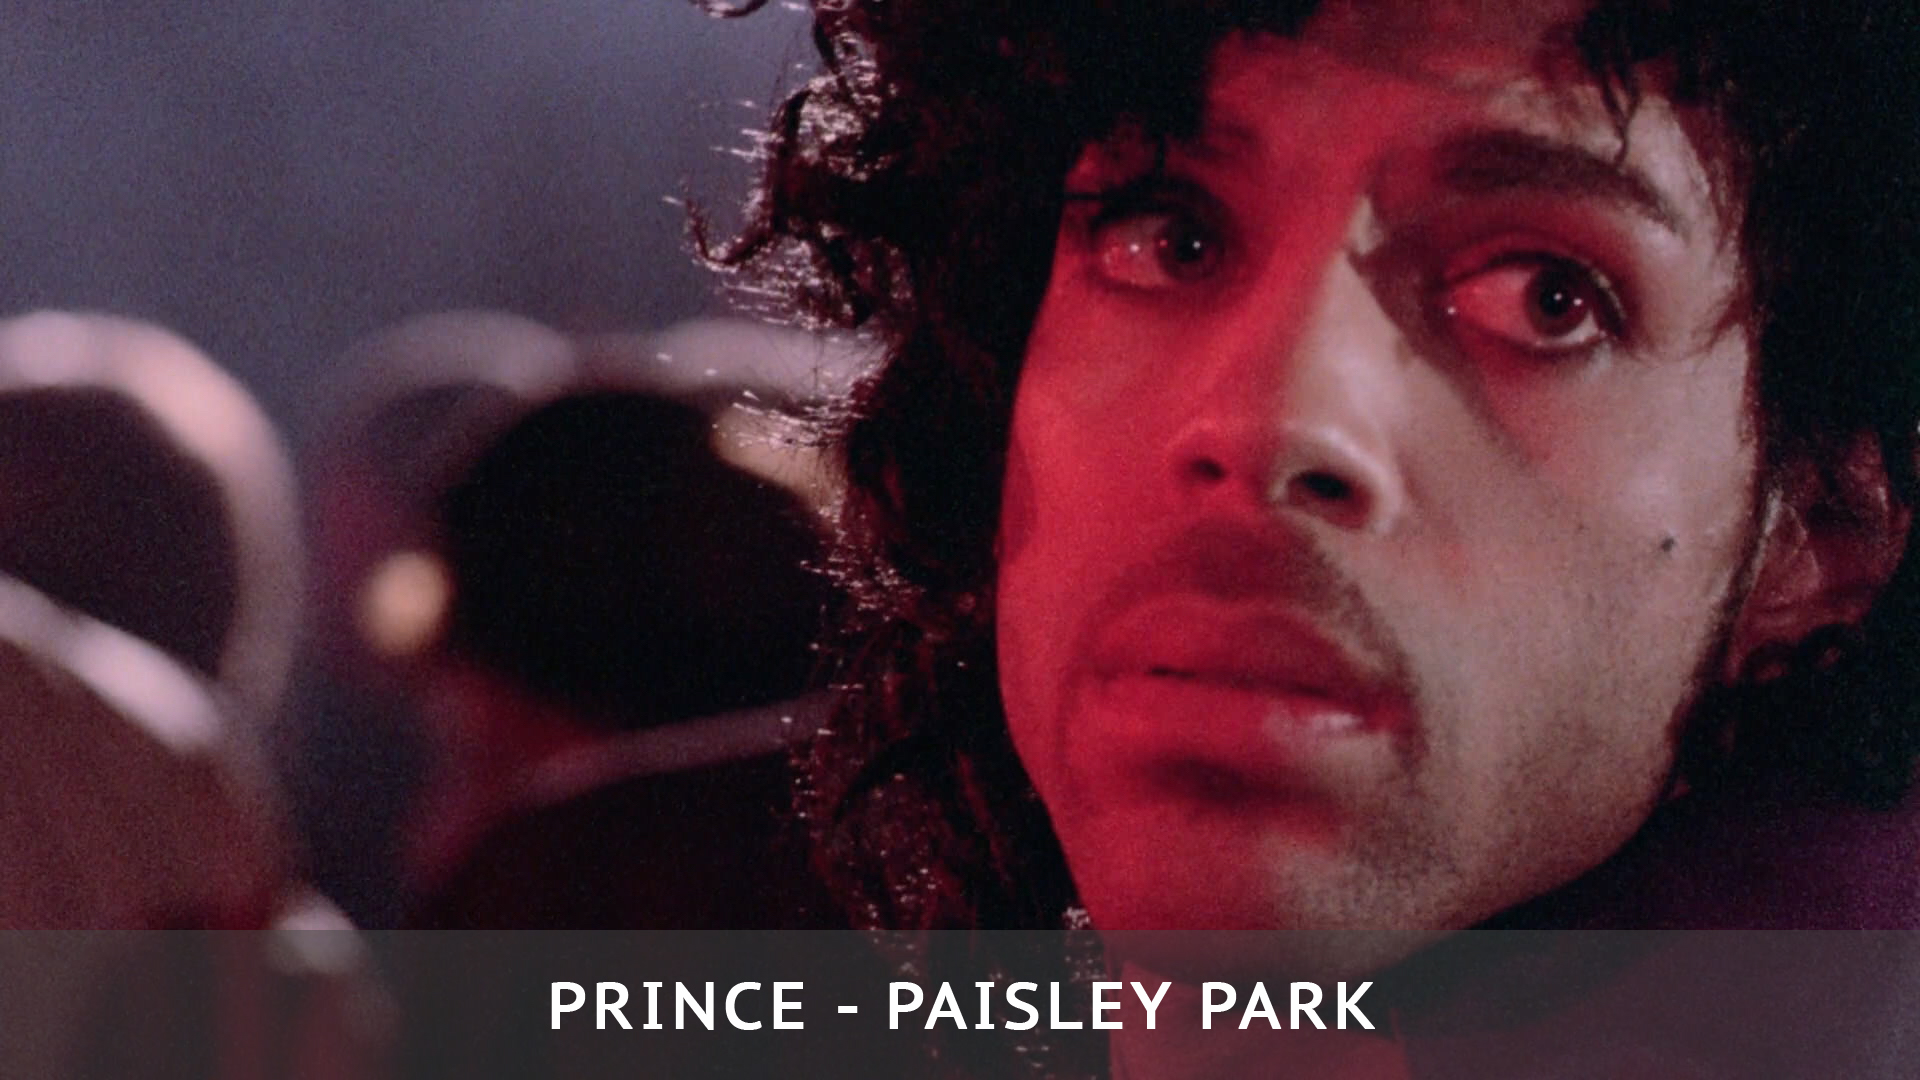 Prince - Paisley Park - Color Grading / Color Correction / Post Production